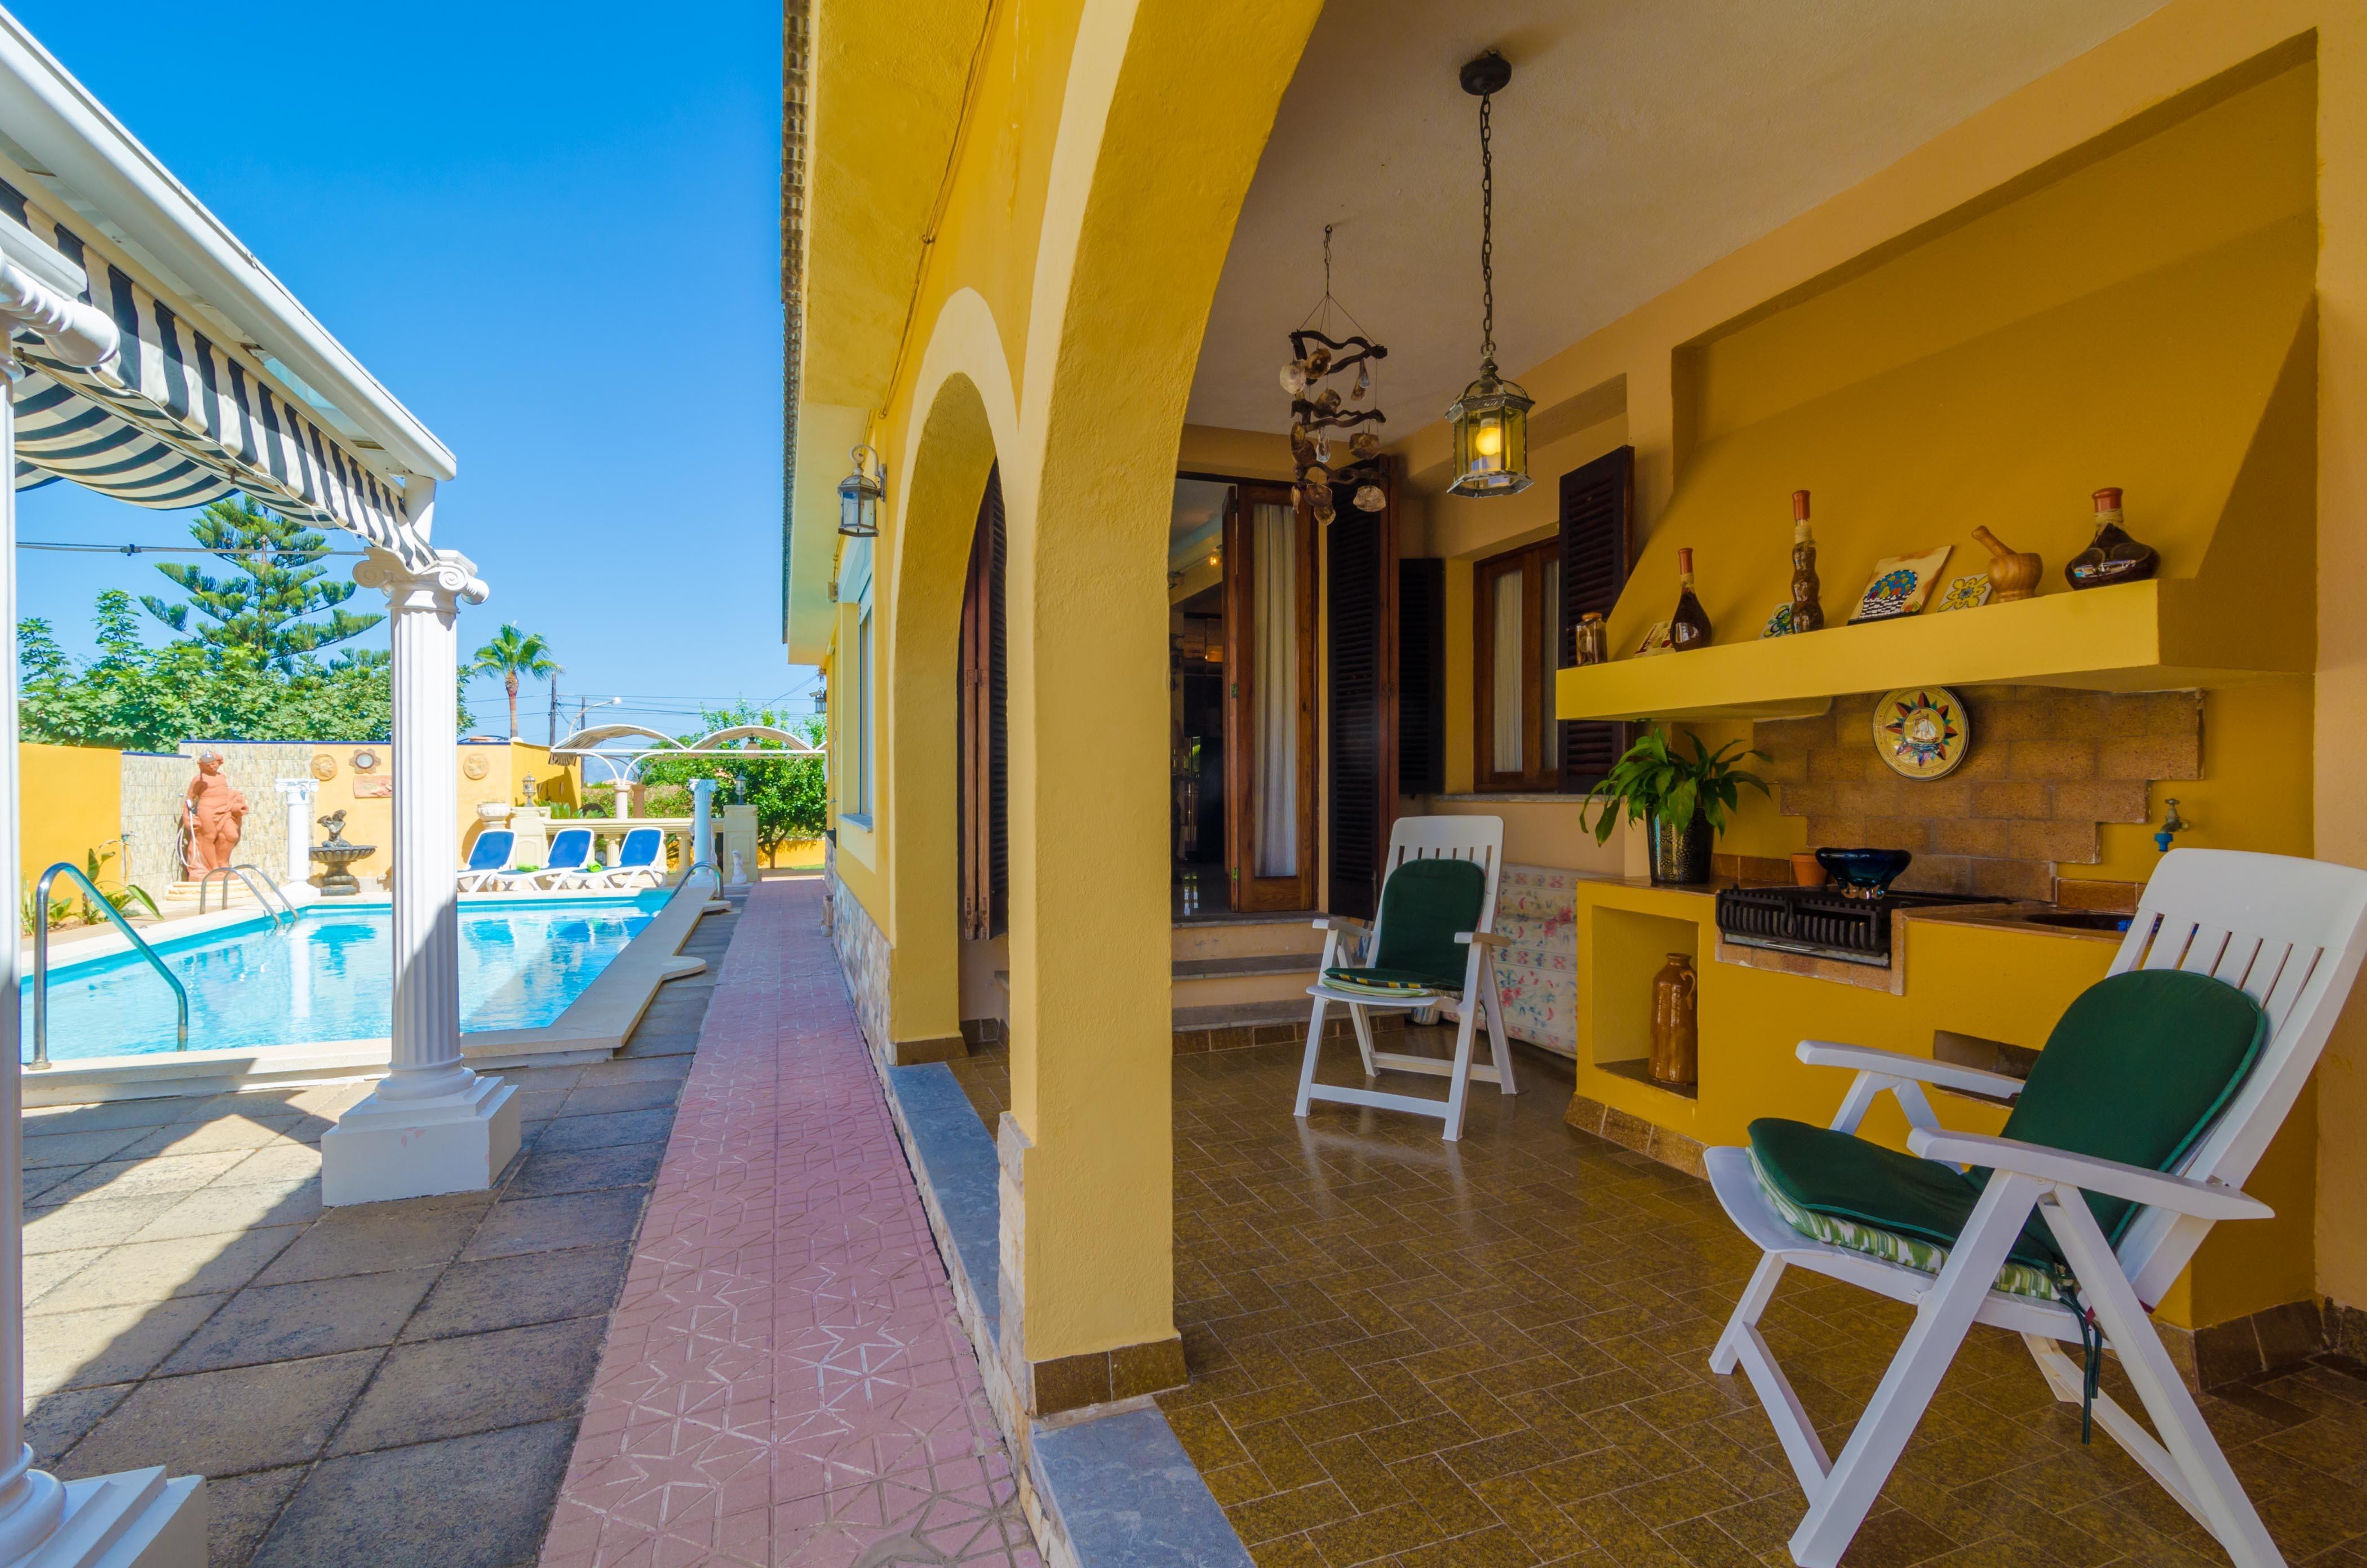 Ferienhaus CAN GORI (2296828), Badia Gran, Mallorca, Balearische Inseln, Spanien, Bild 7